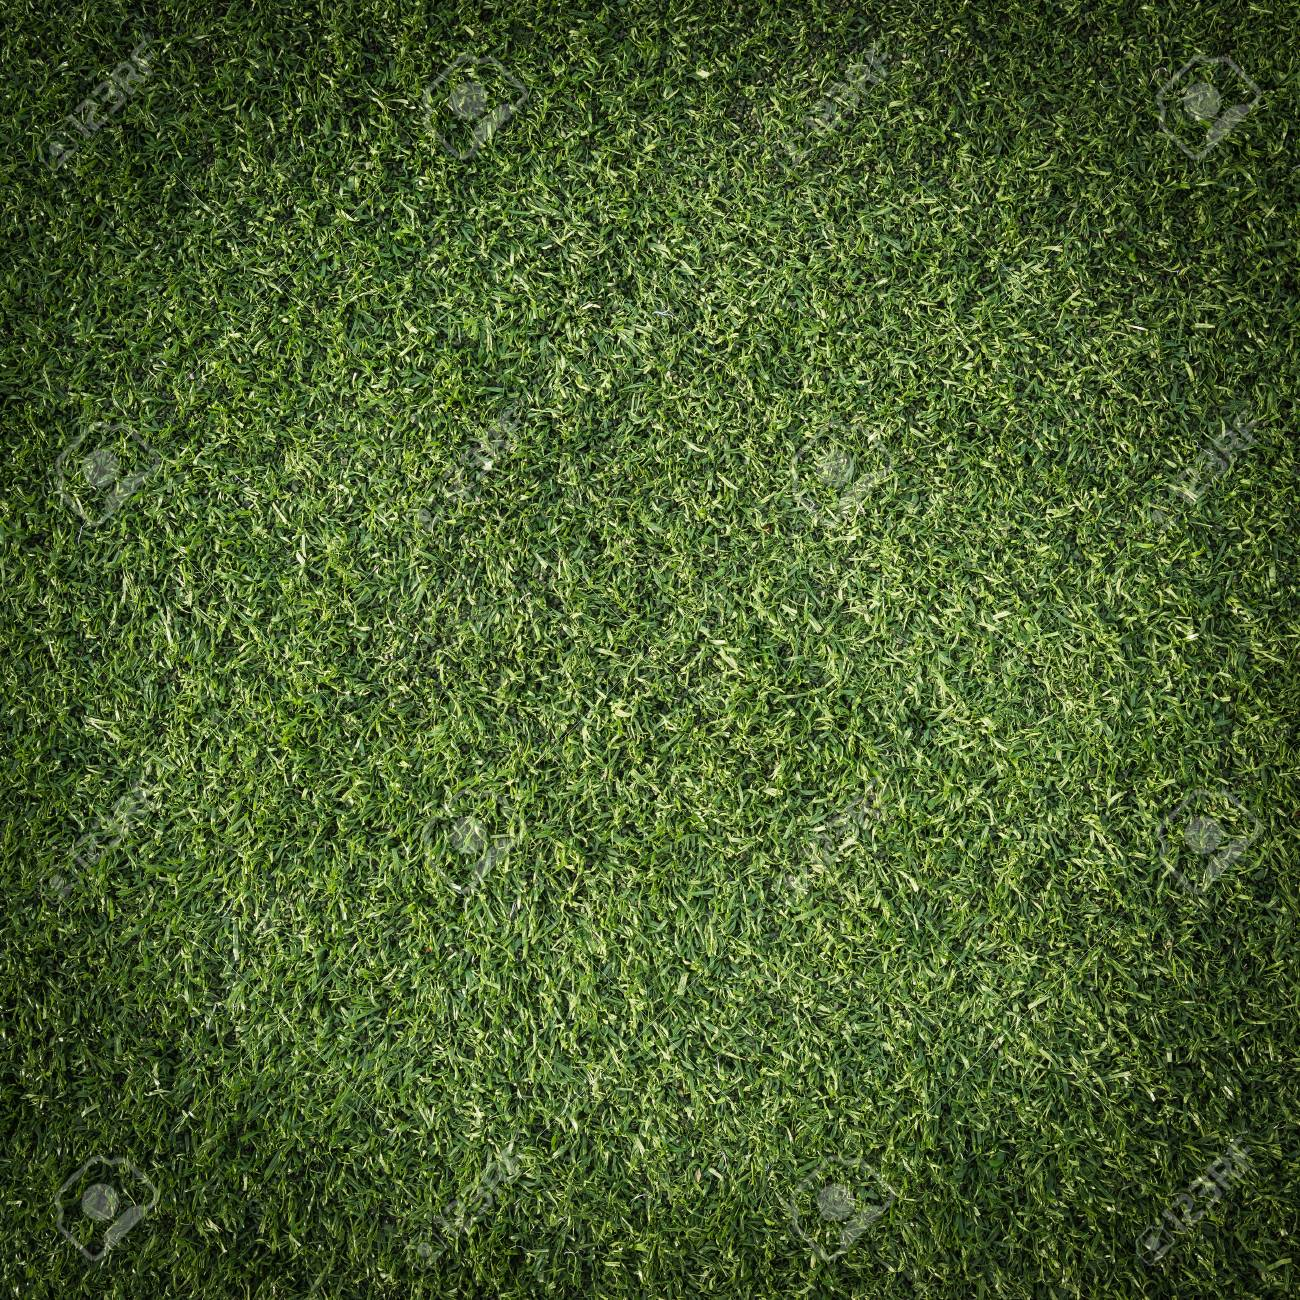 Green grass surface Stock Photo - 15829005